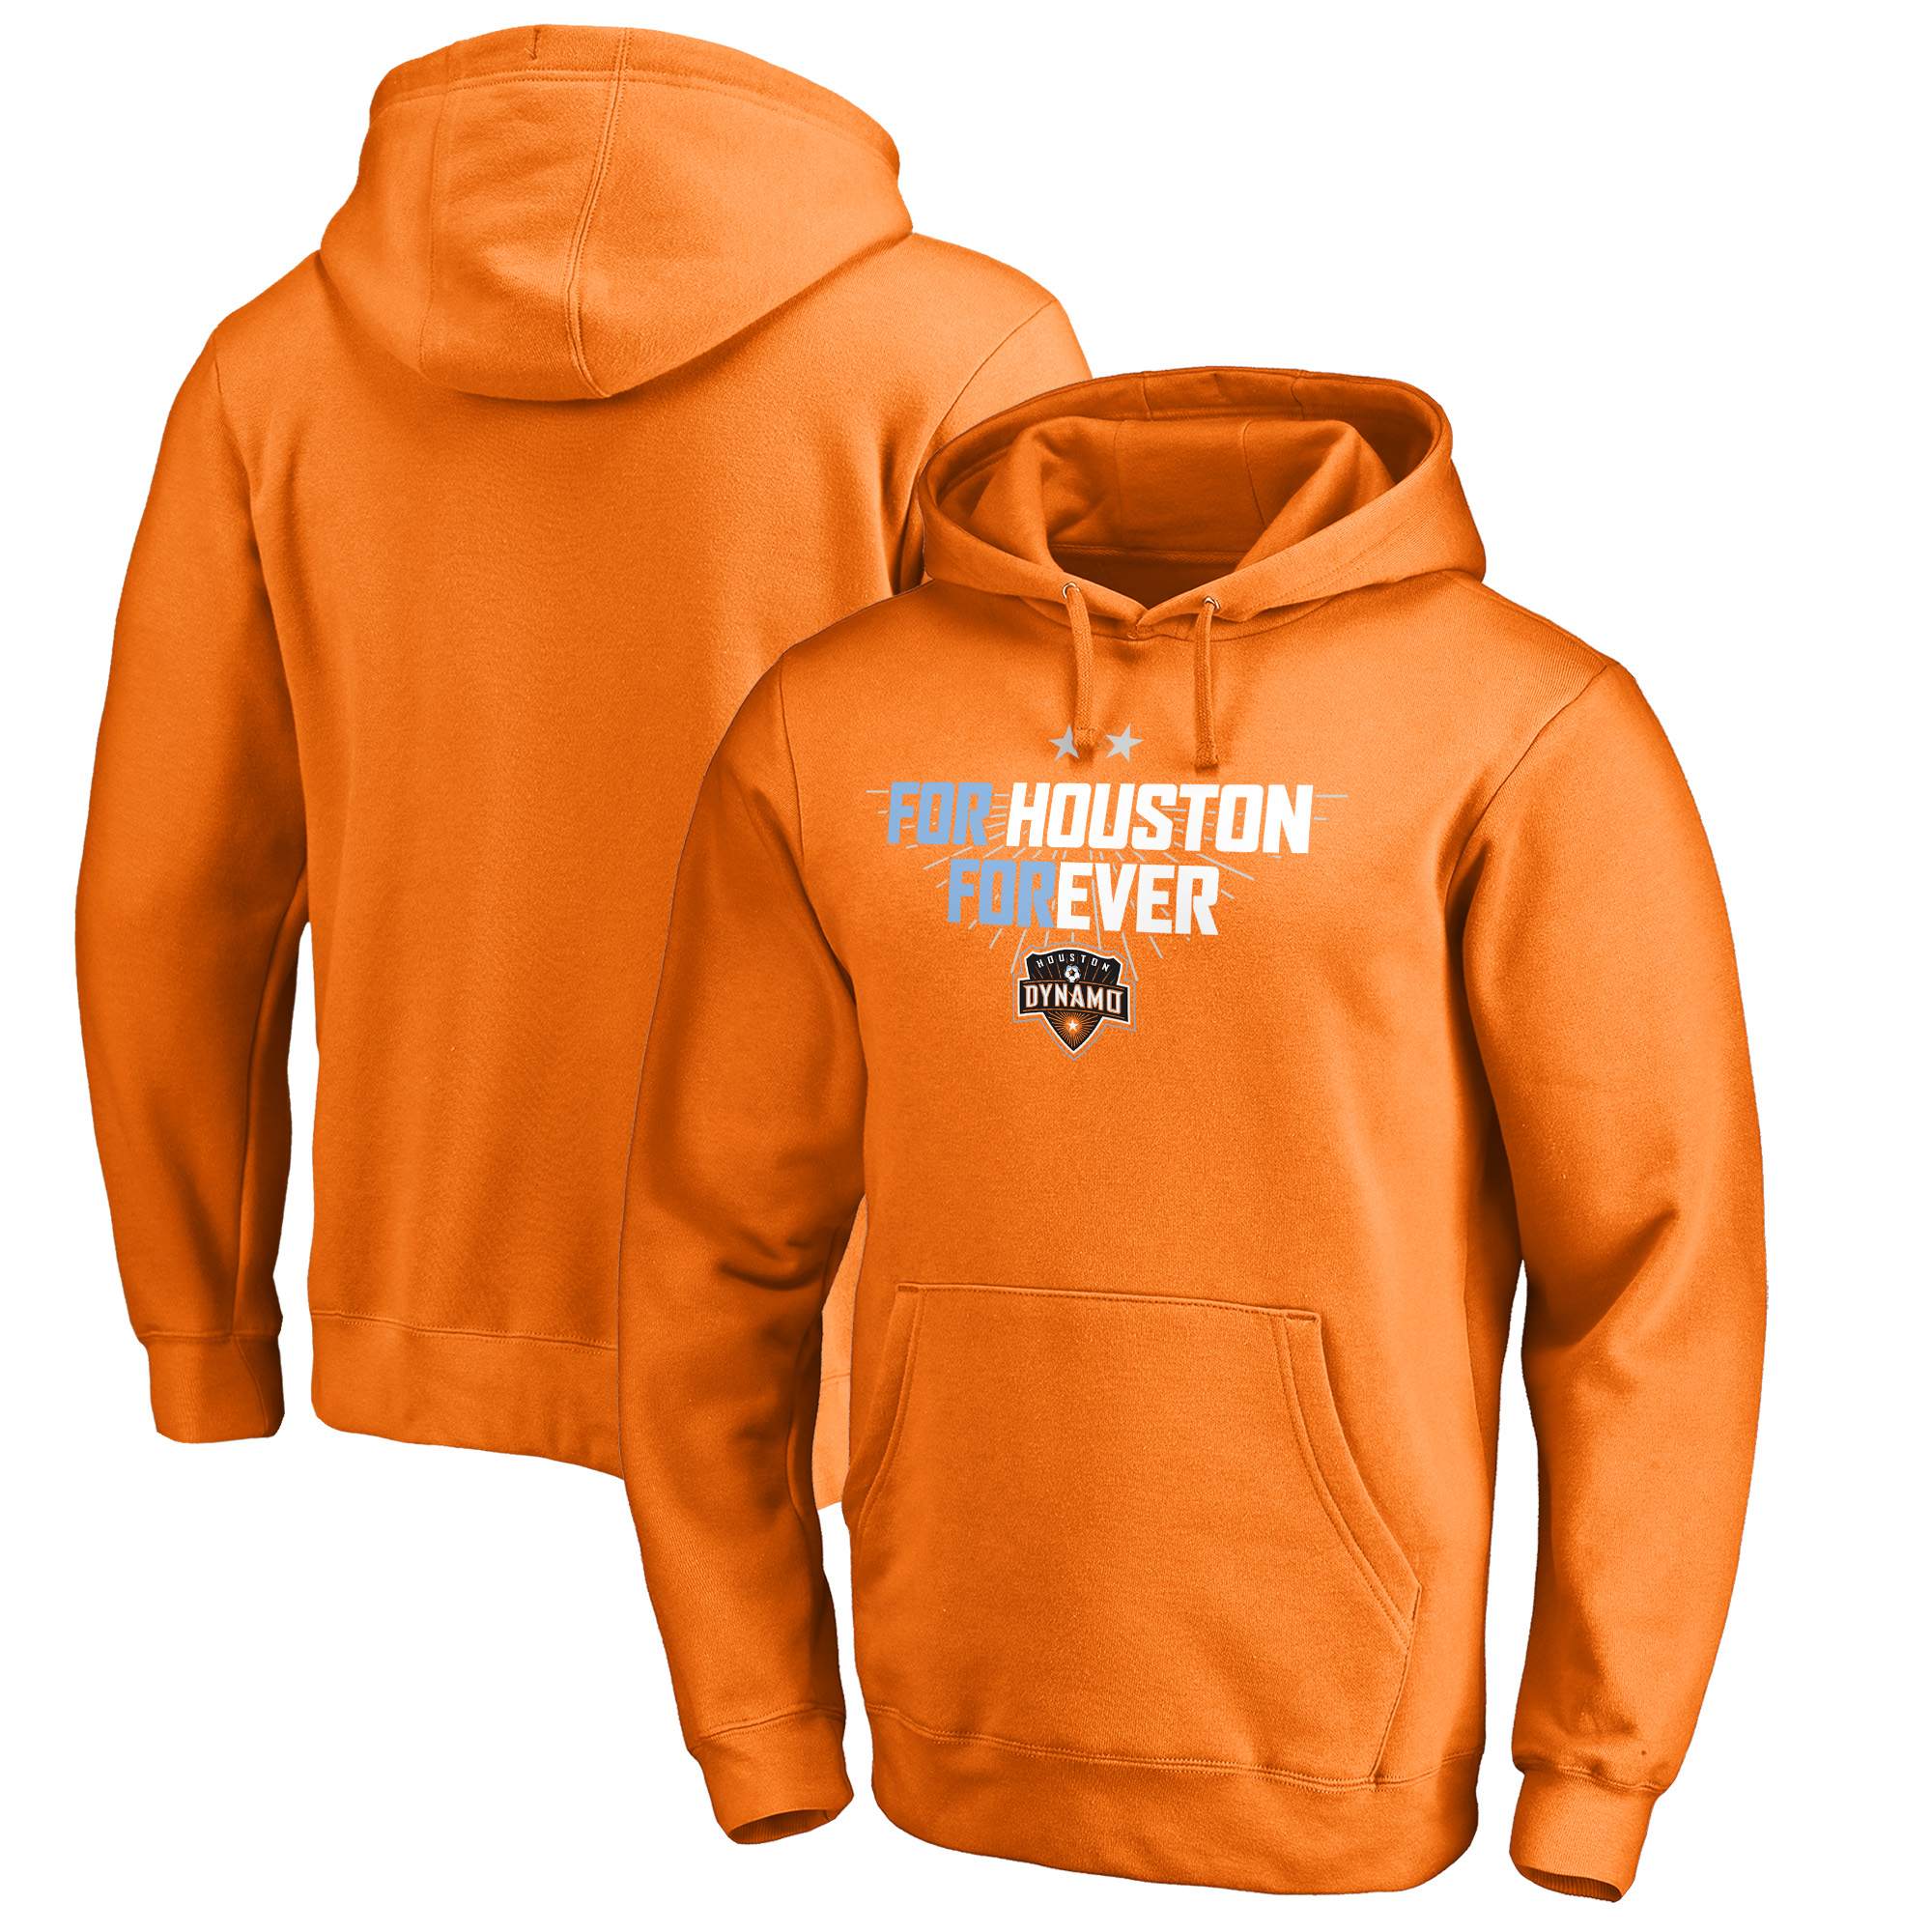 Houston Dynamo Fanatics Branded For Houston Pullover Hoodie - Tenn Orange